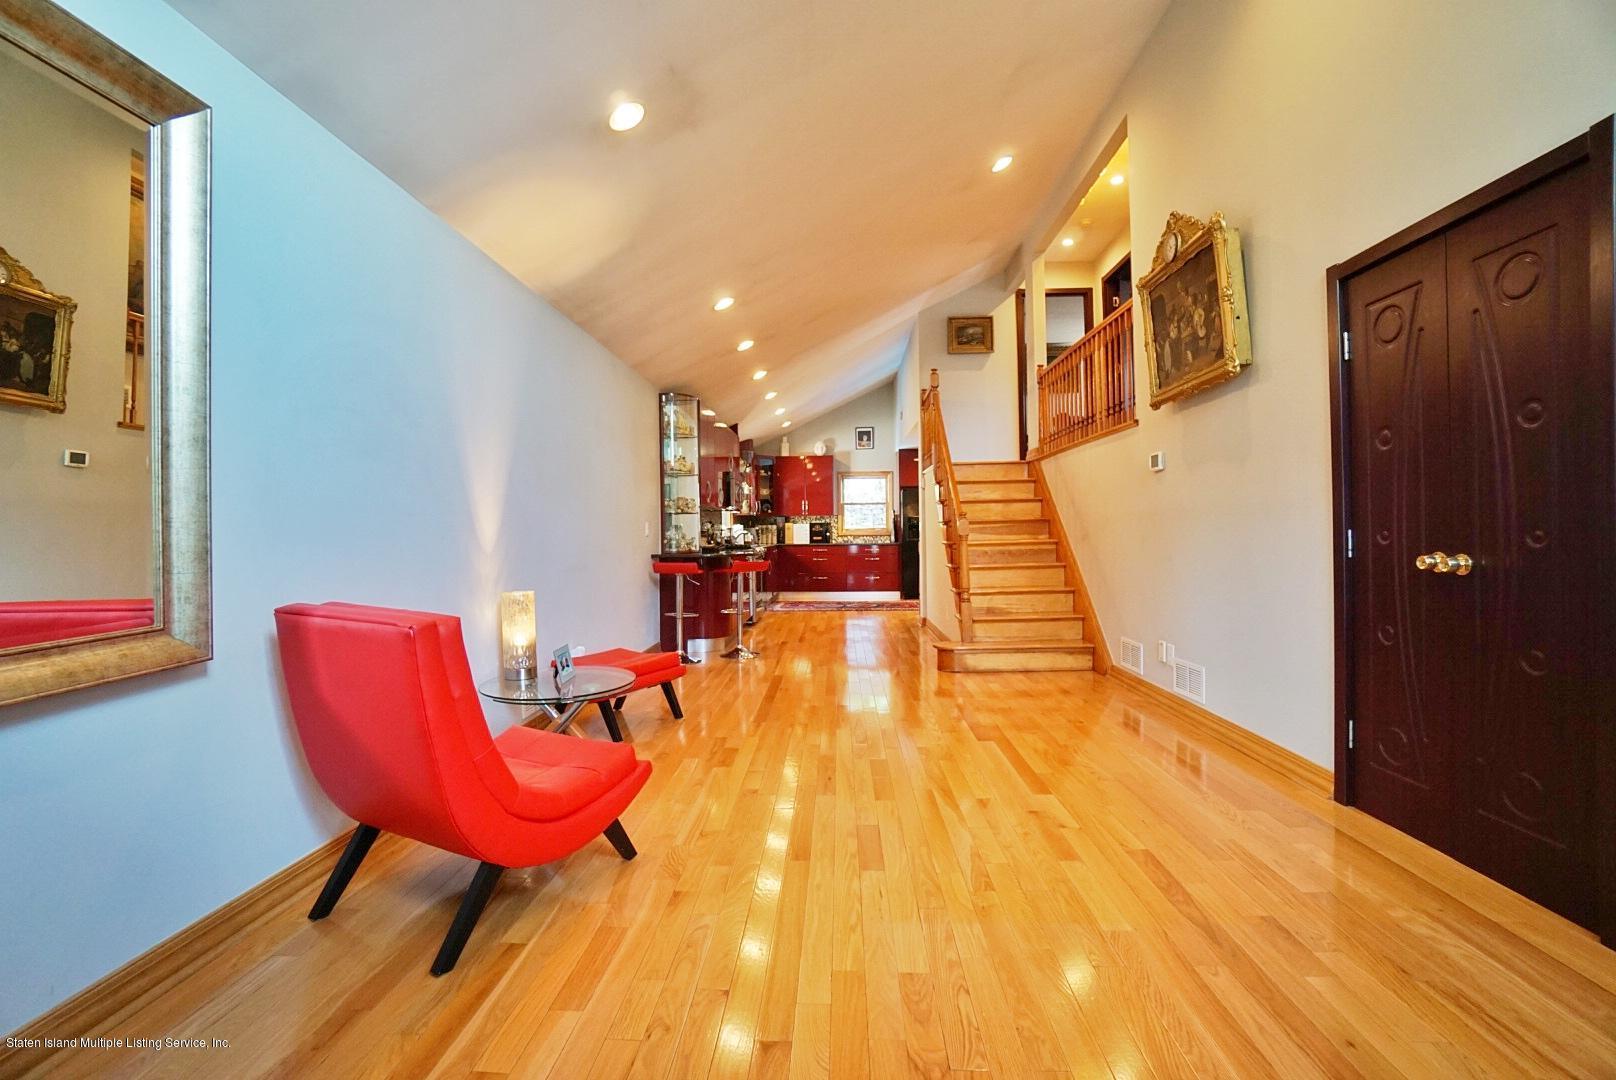 Single Family - Detached 48 Ocean Terrace  Staten Island, NY 10314, MLS-1130826-10